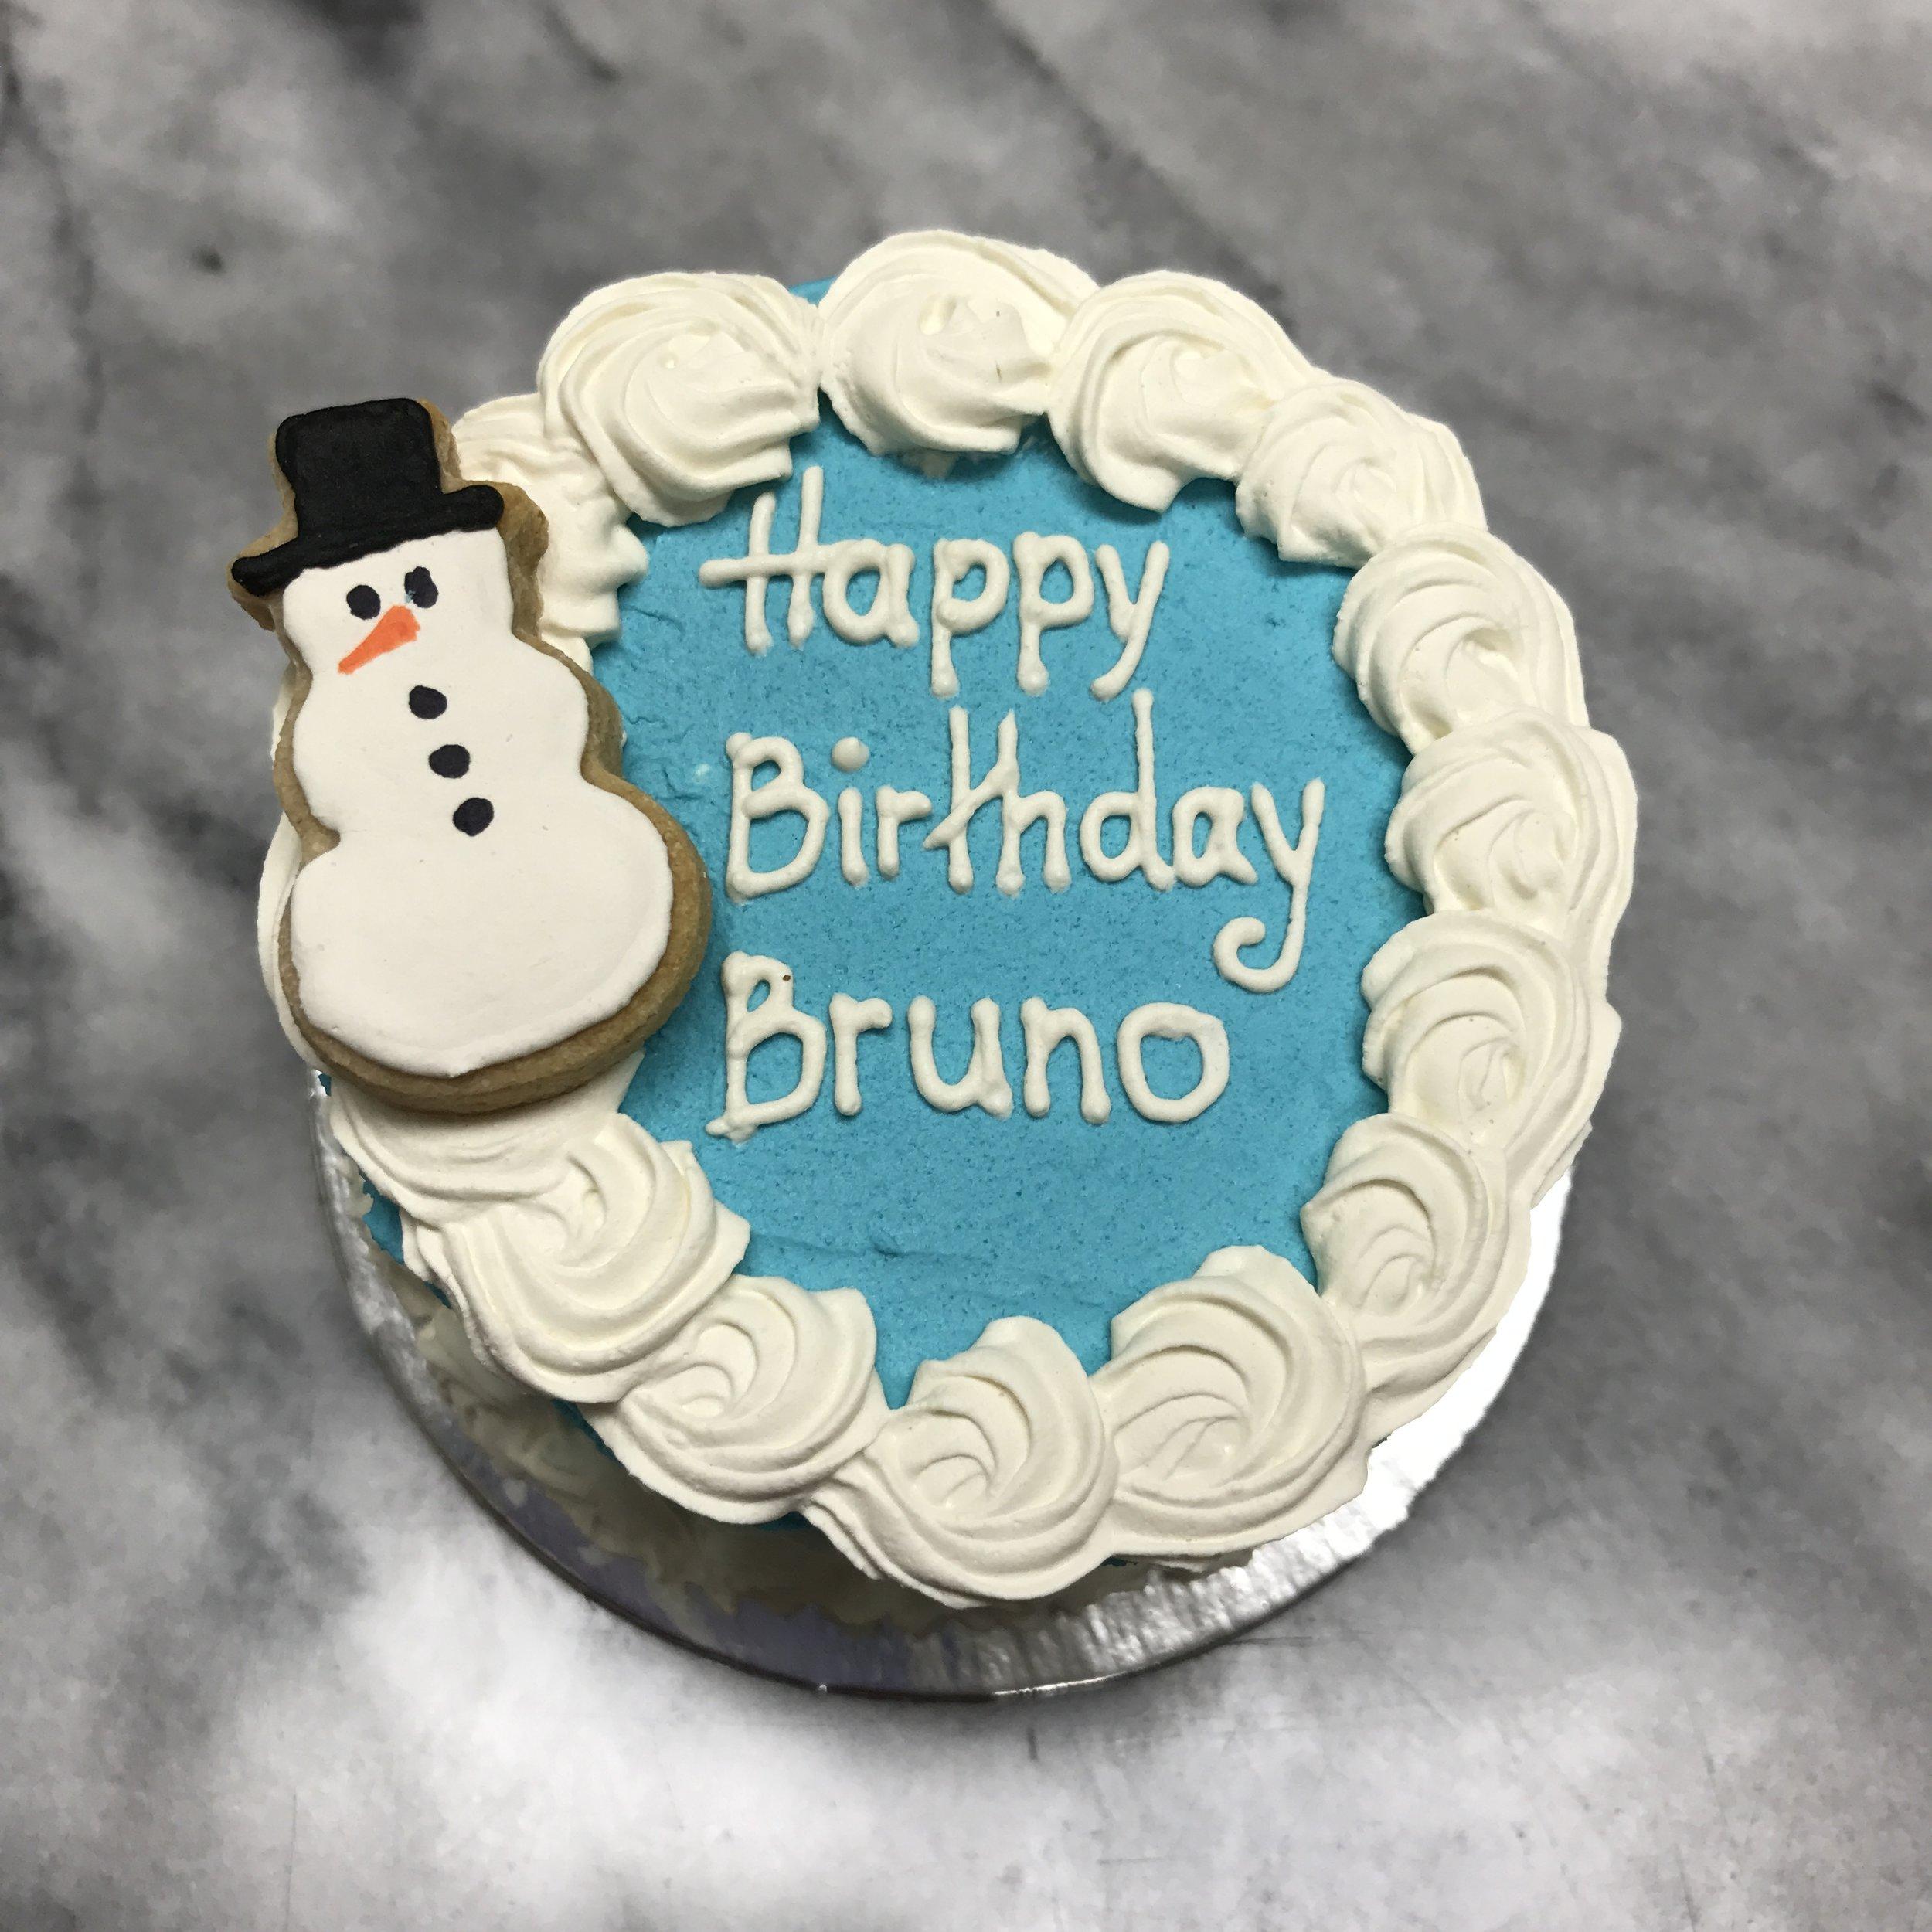 Bruno's cake 2017.JPG